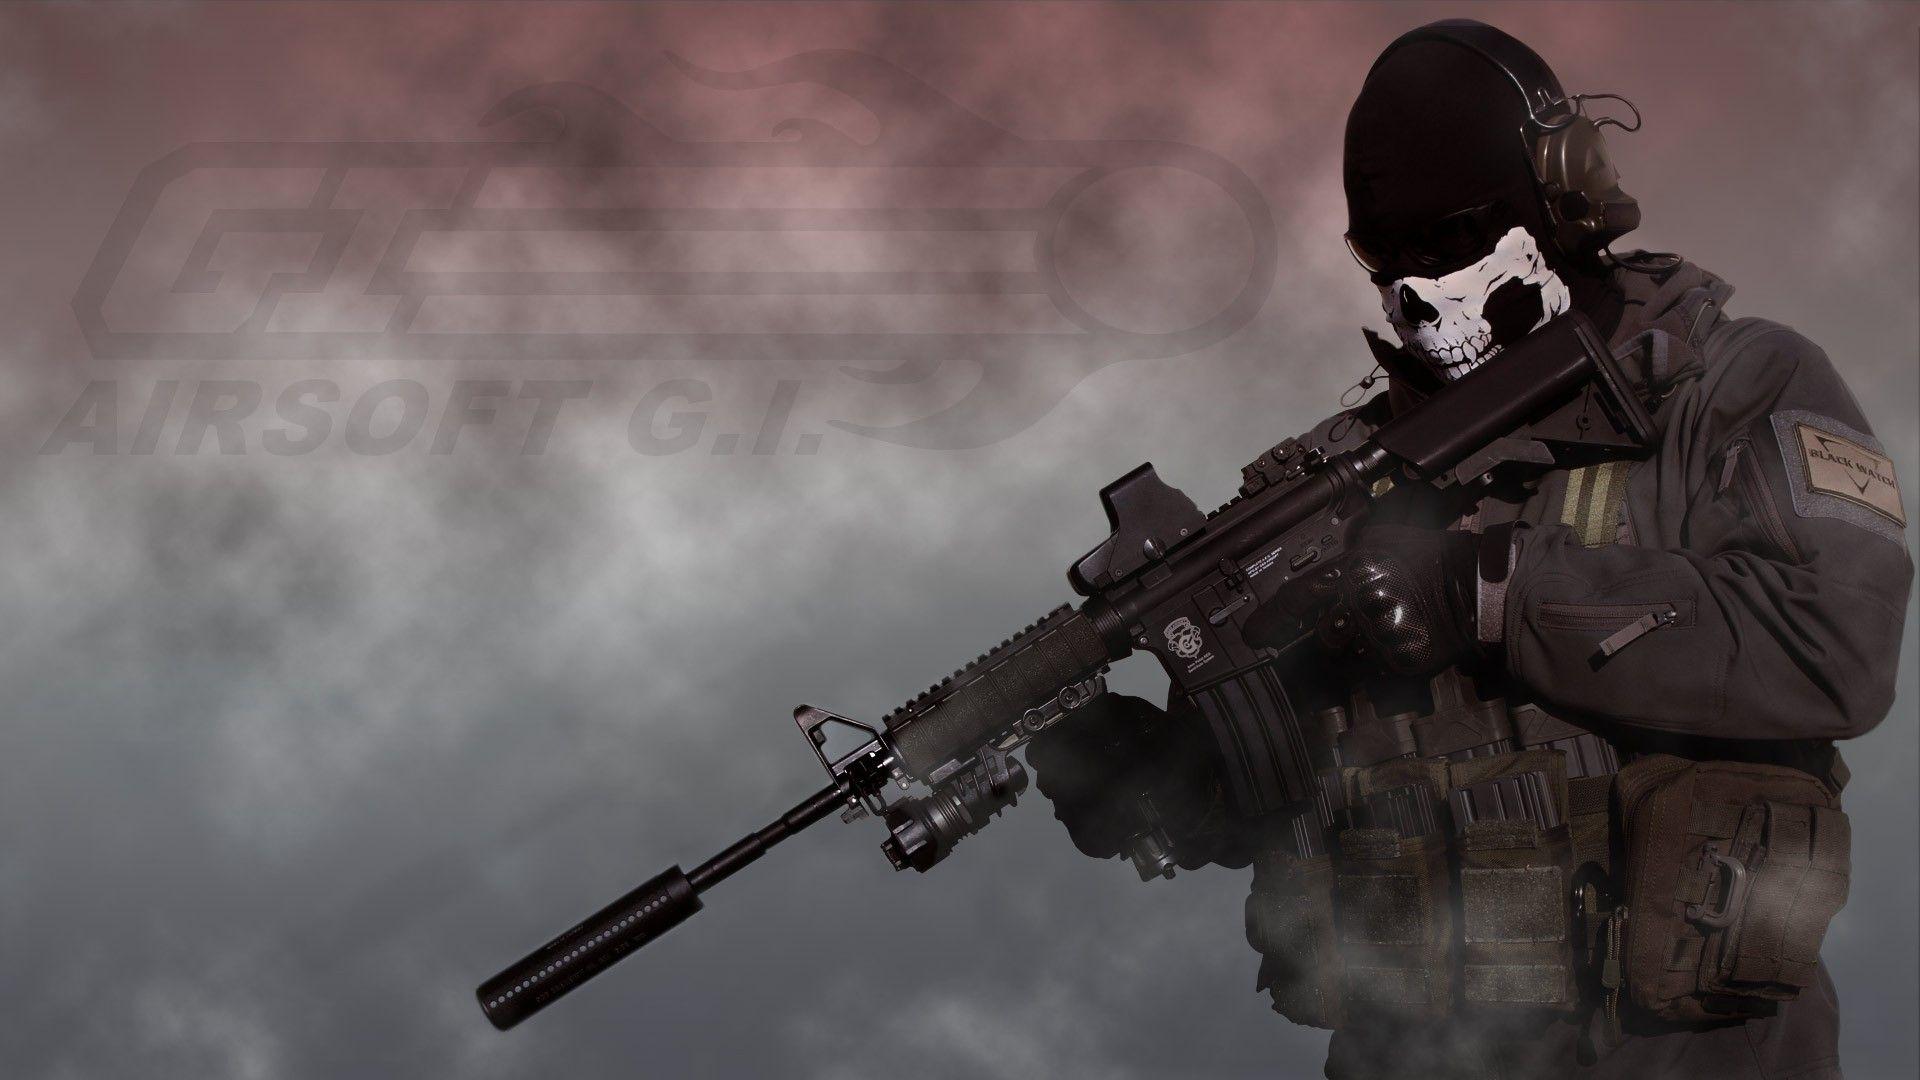 Sniper Rifle Wallpaper HD